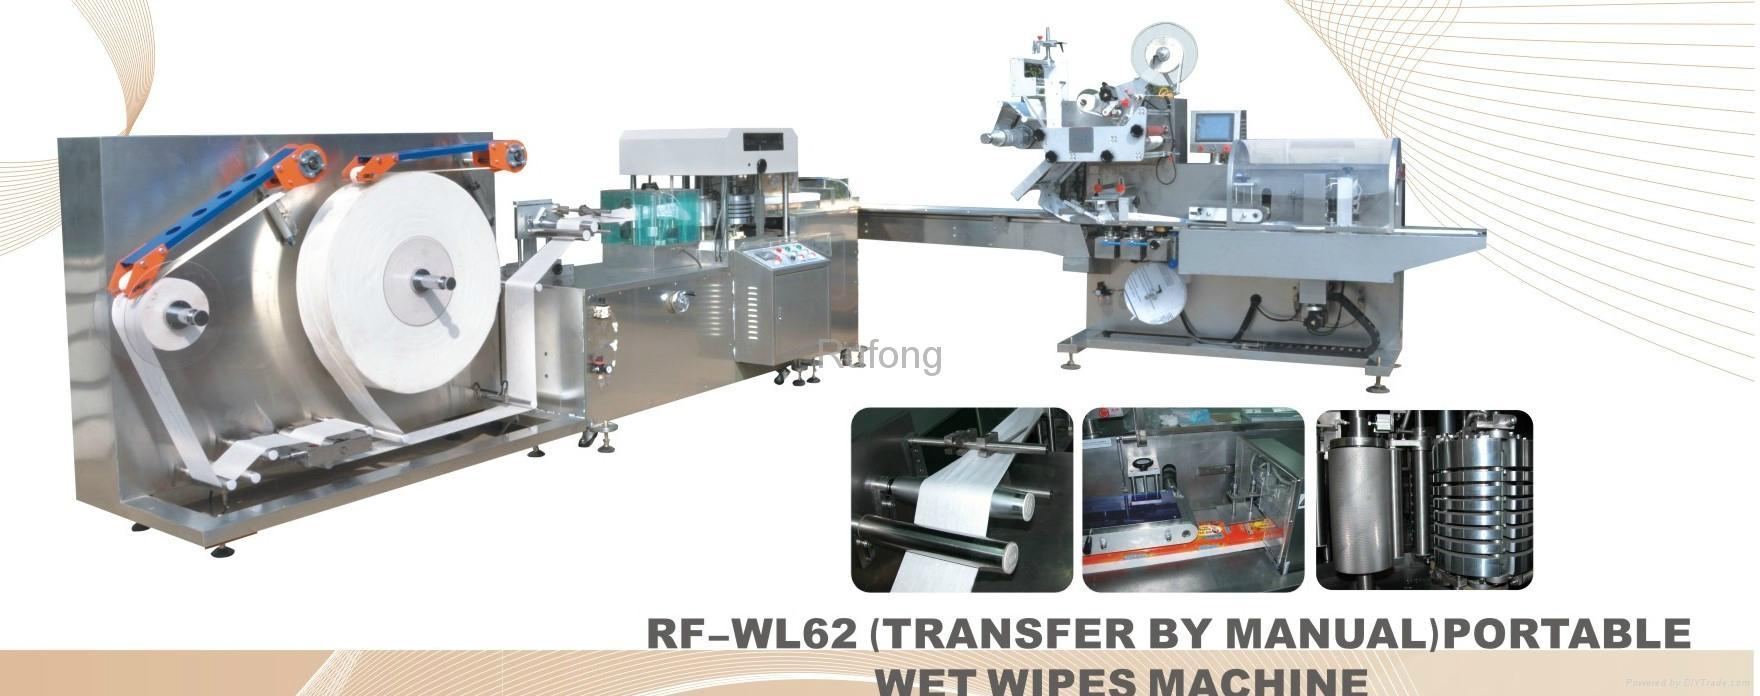 RF-WL62 (Transfer by Manual) Portable Wet Wipes Machine 3